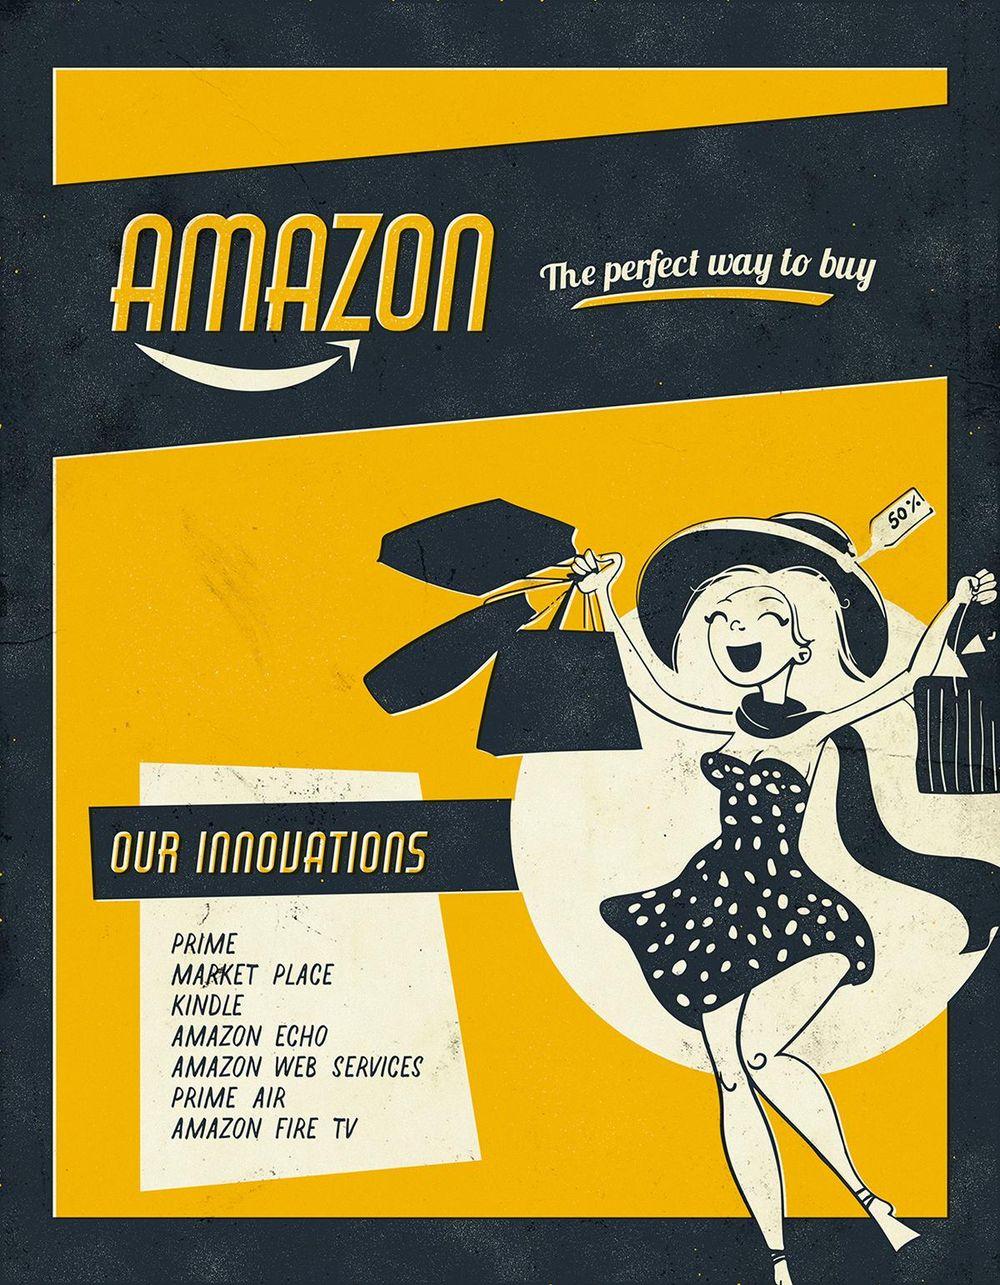 Amazon - image 4 - student project